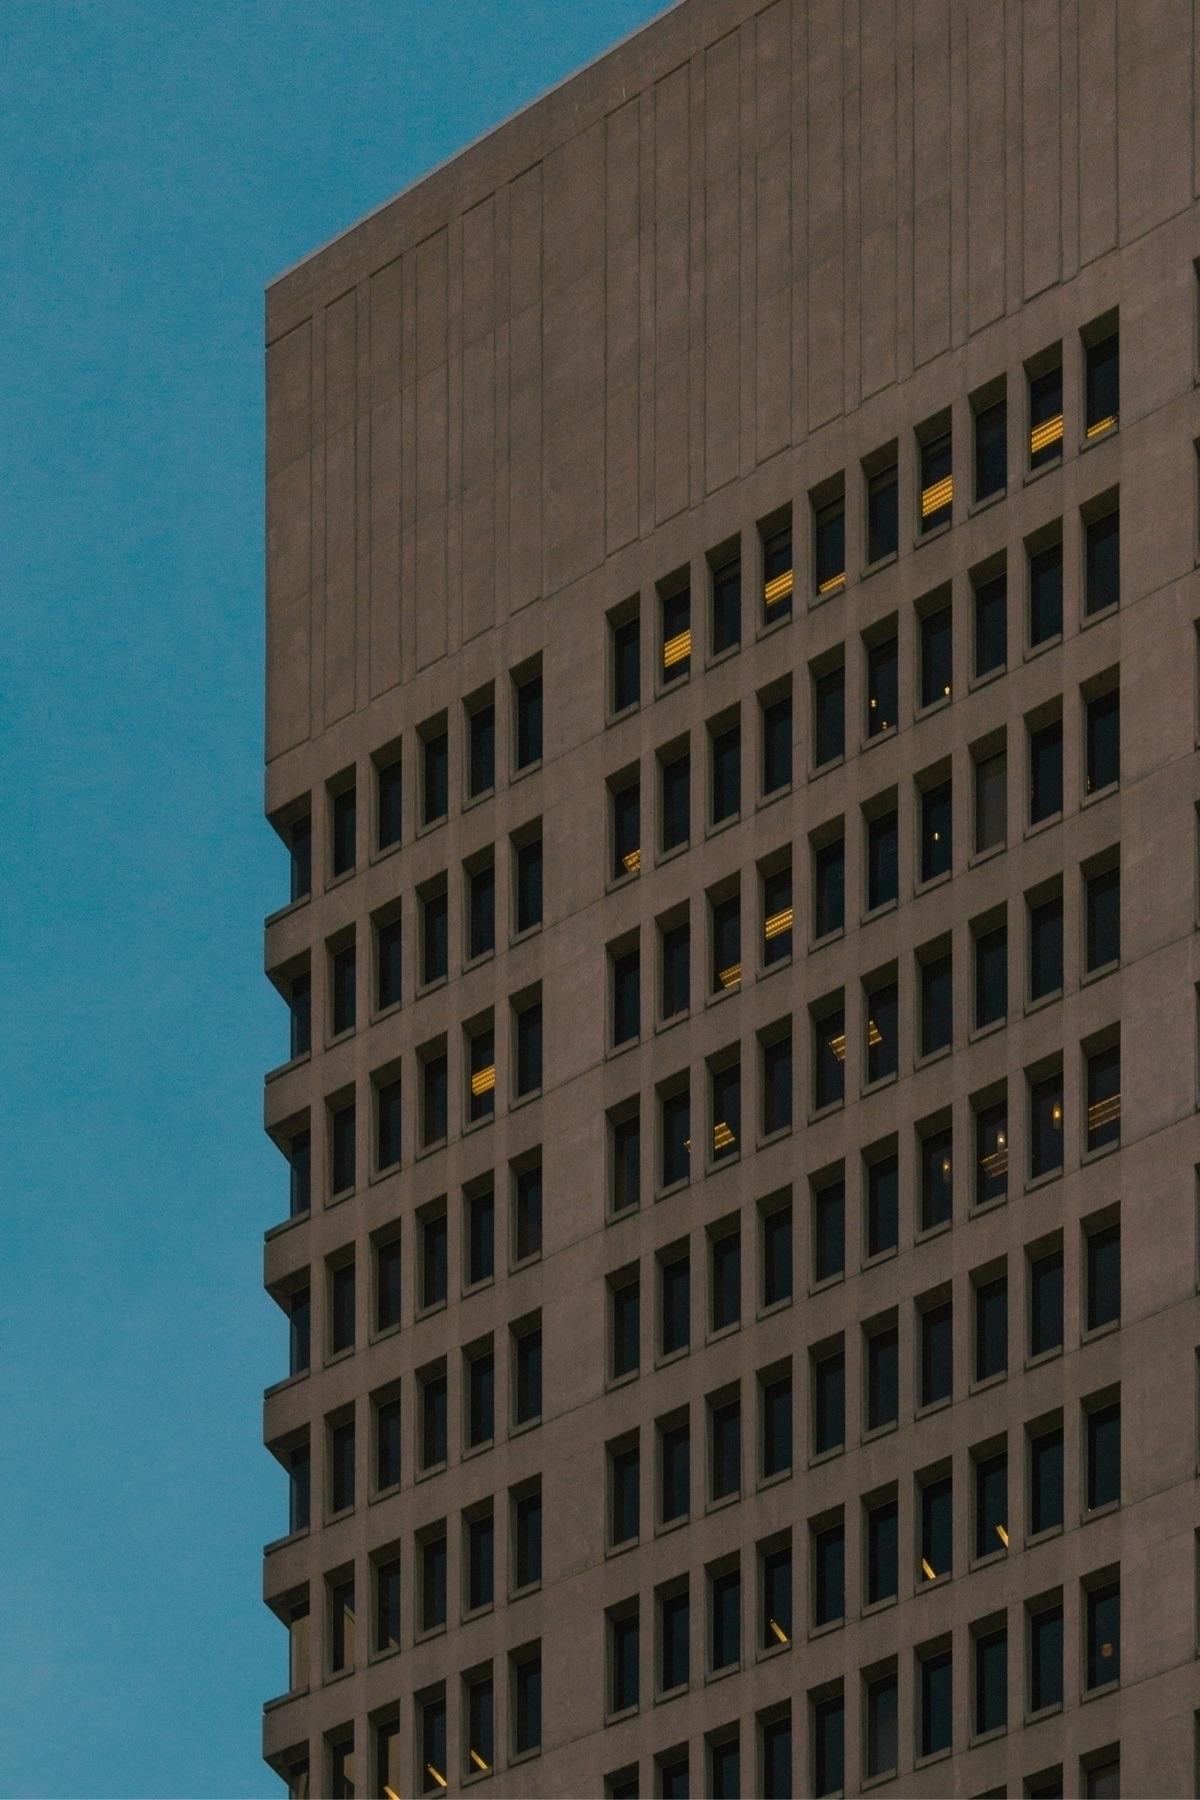 1934 • vsco shop - architecture - spookymatt | ello